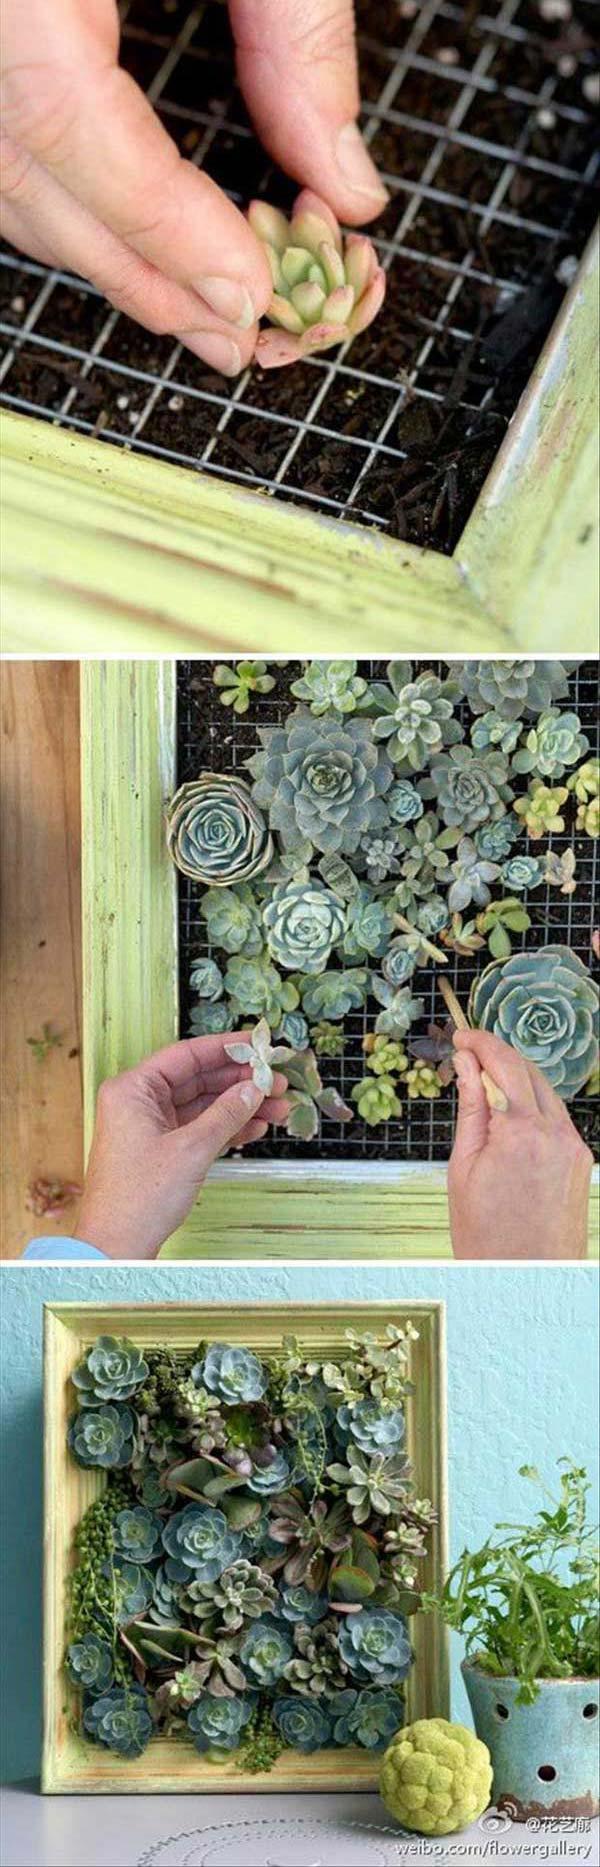 Awesome indoor mini garden ideas for Indoor mini garden ideas